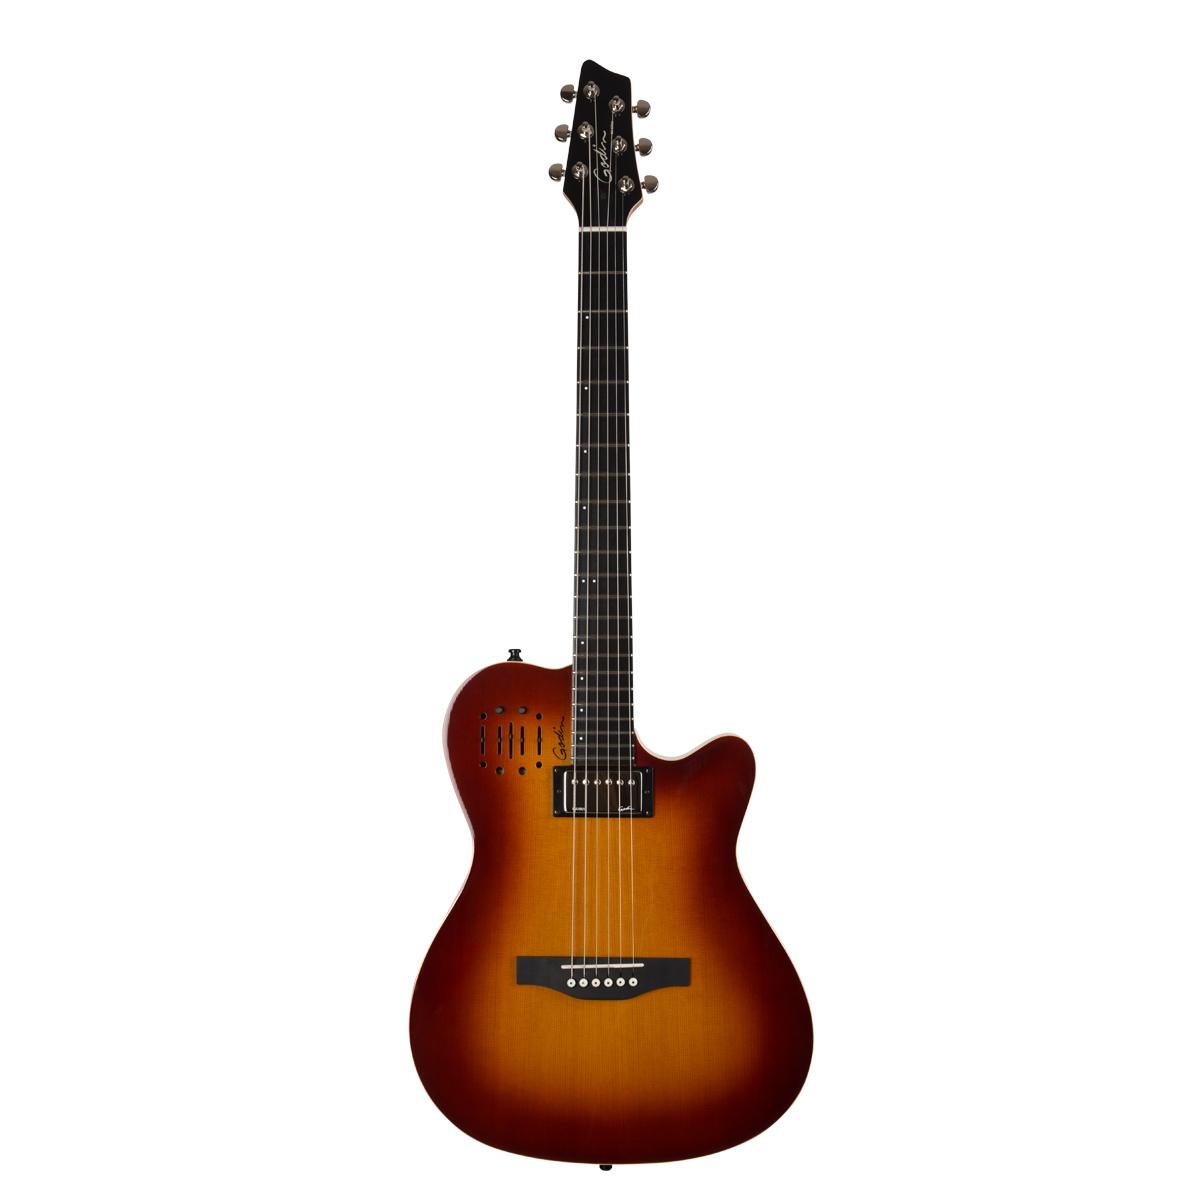 Godin 30286 A6 Ultra Cognac Burst Acoustic Electric Guitar